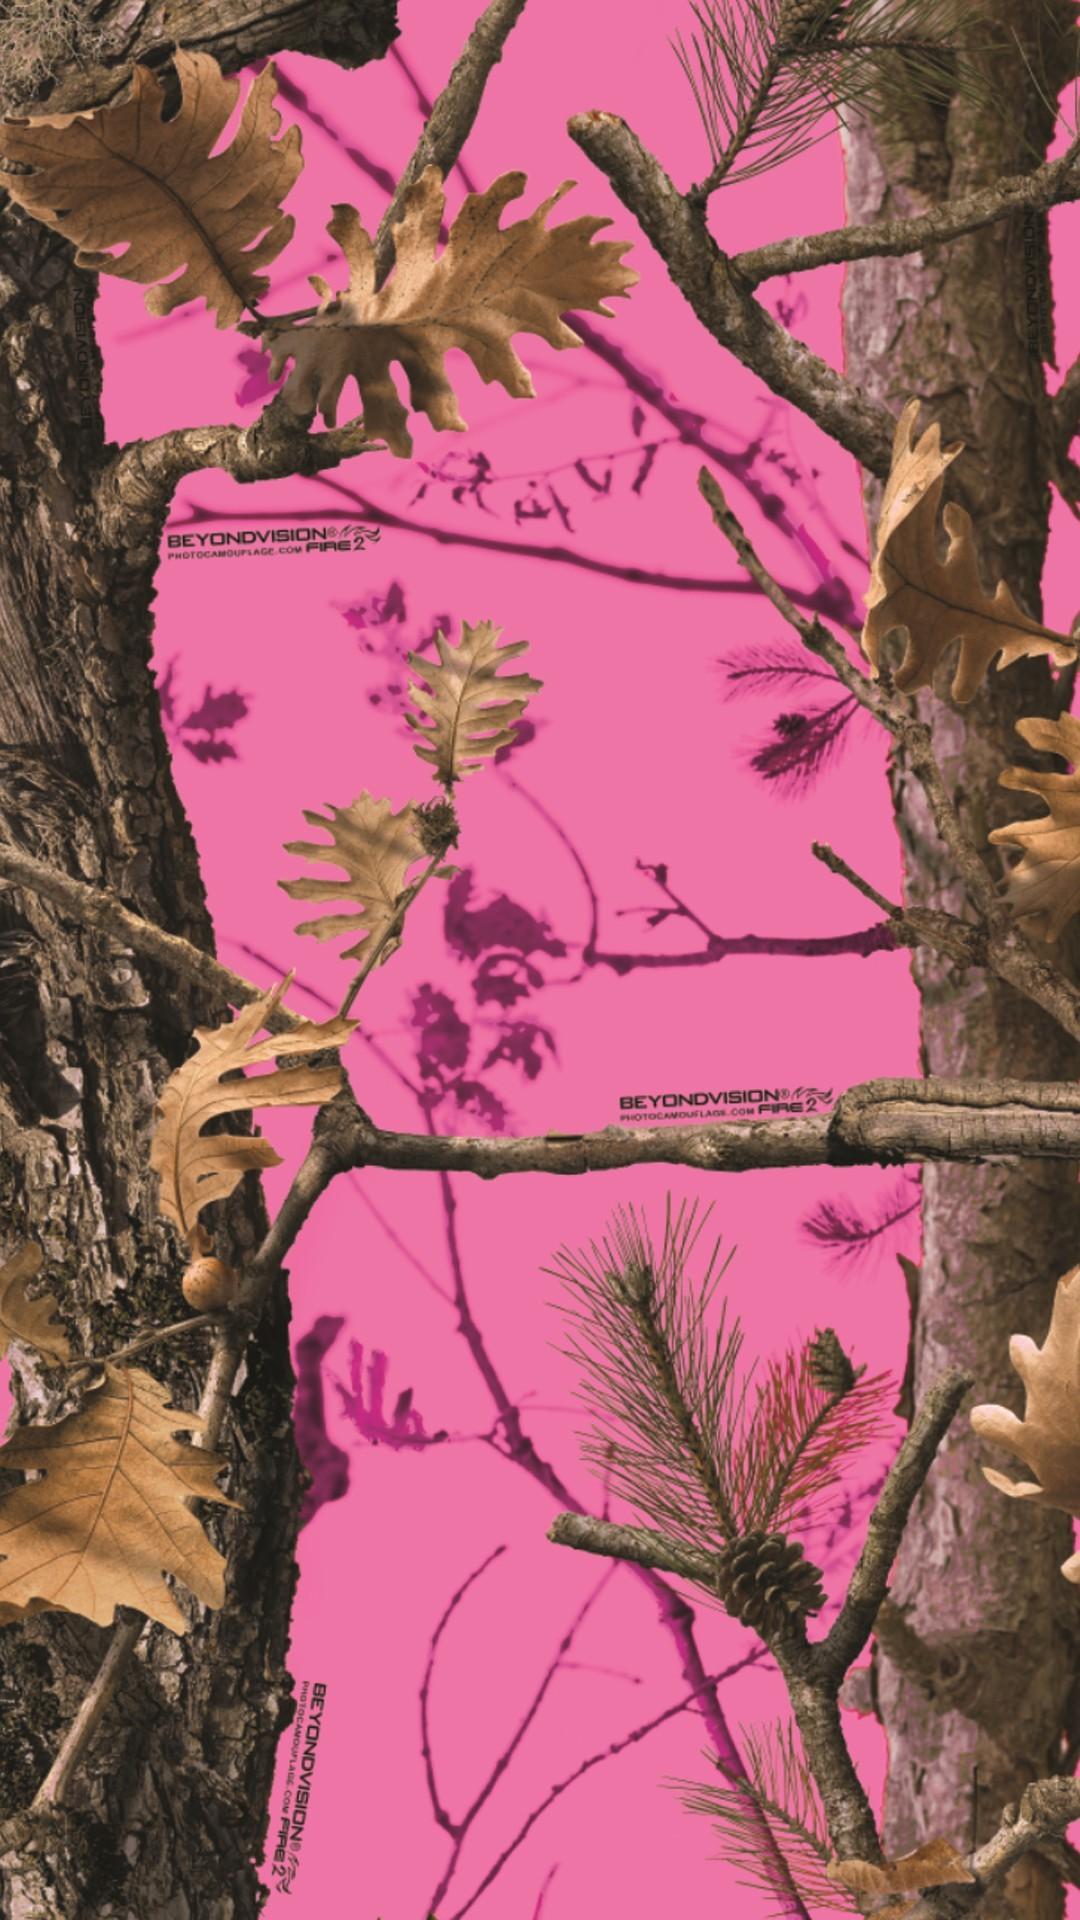 Girly-Galaxy-Wallpaper – pink-camo-background-girly-pink-